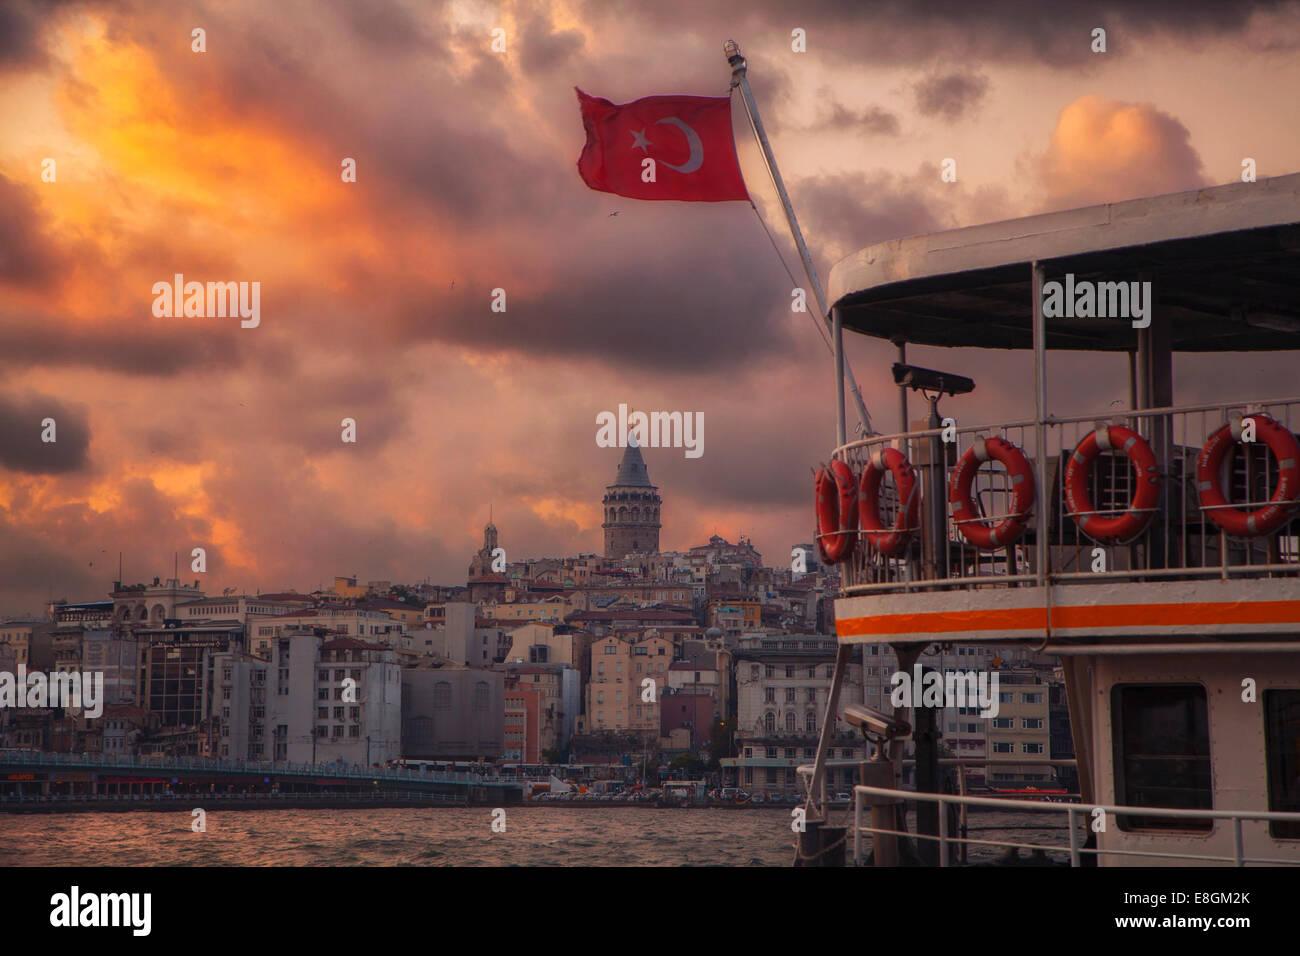 Turkey, Istanbul, Galata Tower - Stock Image